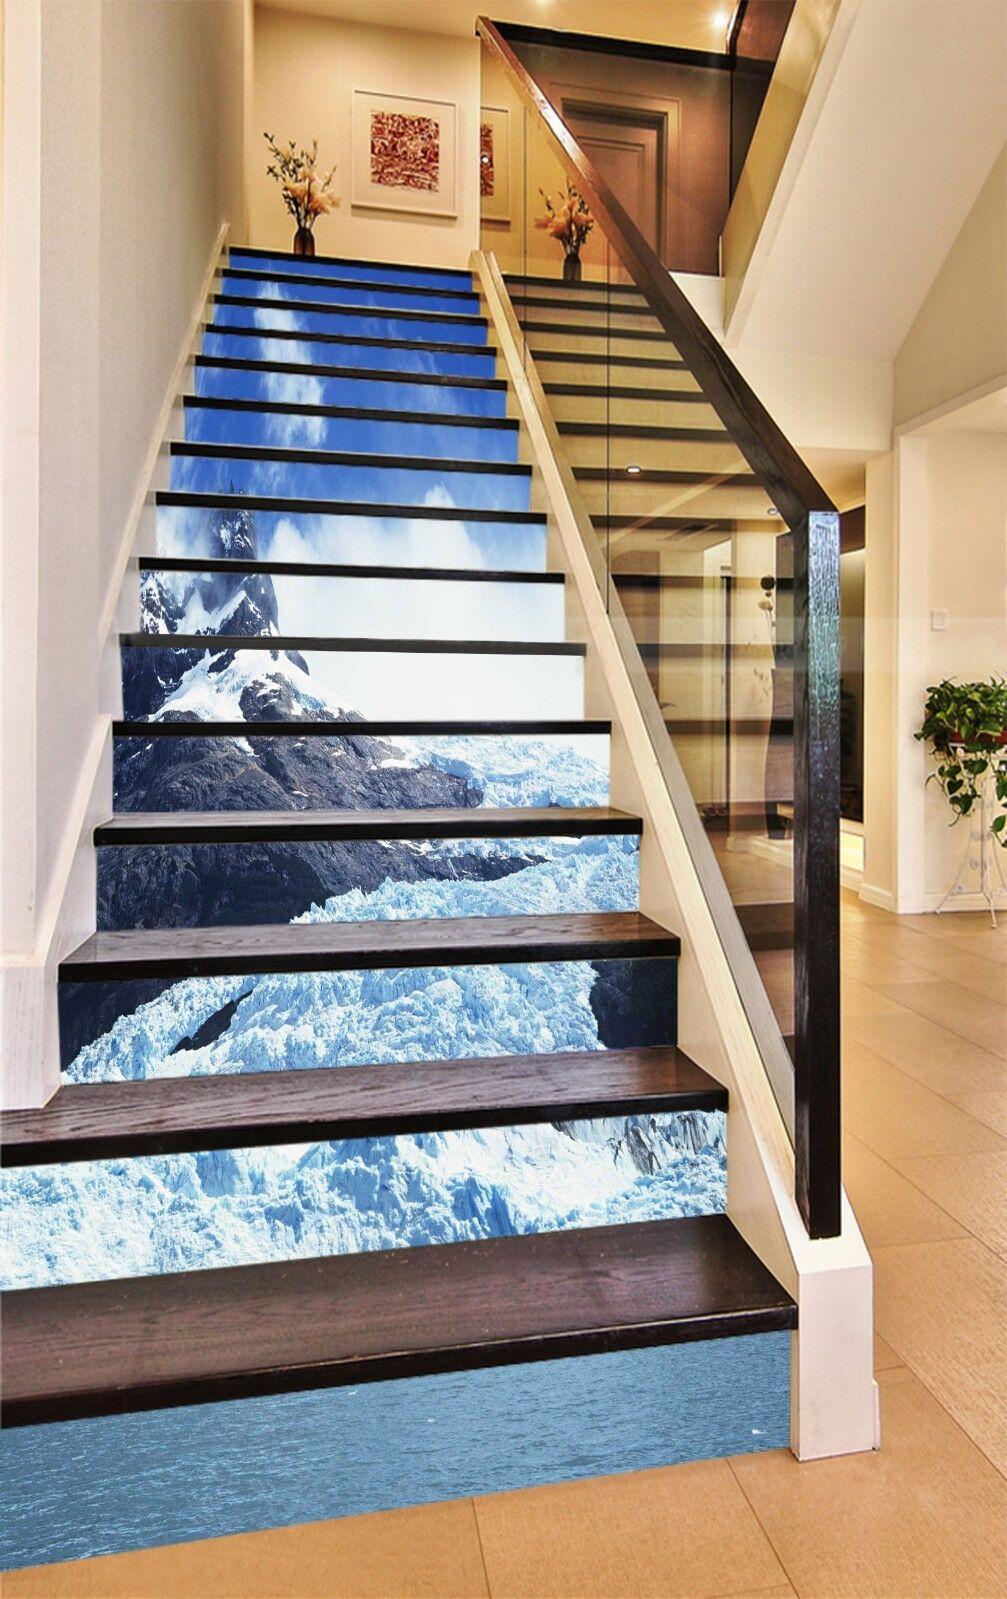 3D Snow Hills Sky Stair Risers Decoration Photo Mural Vinyl Decal Wallpaper CA